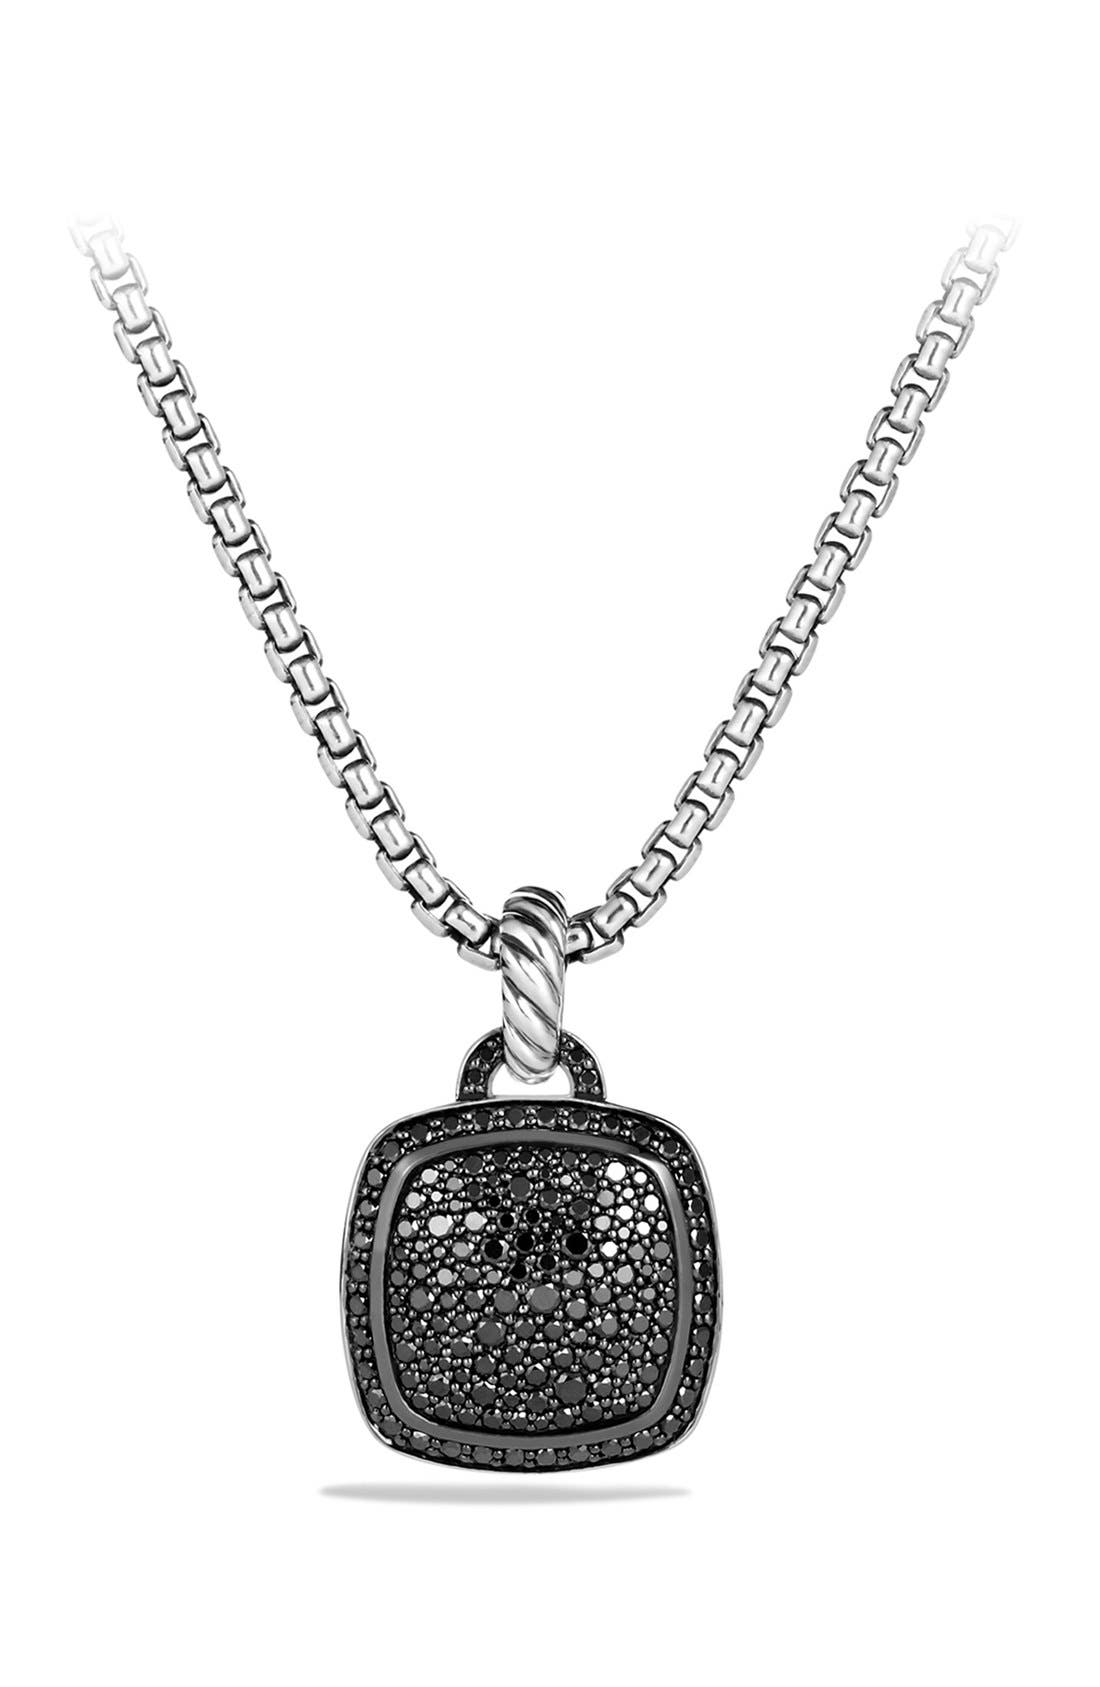 Alternate Image 1 Selected - David Yurman 'Albion' Pendant with Diamonds